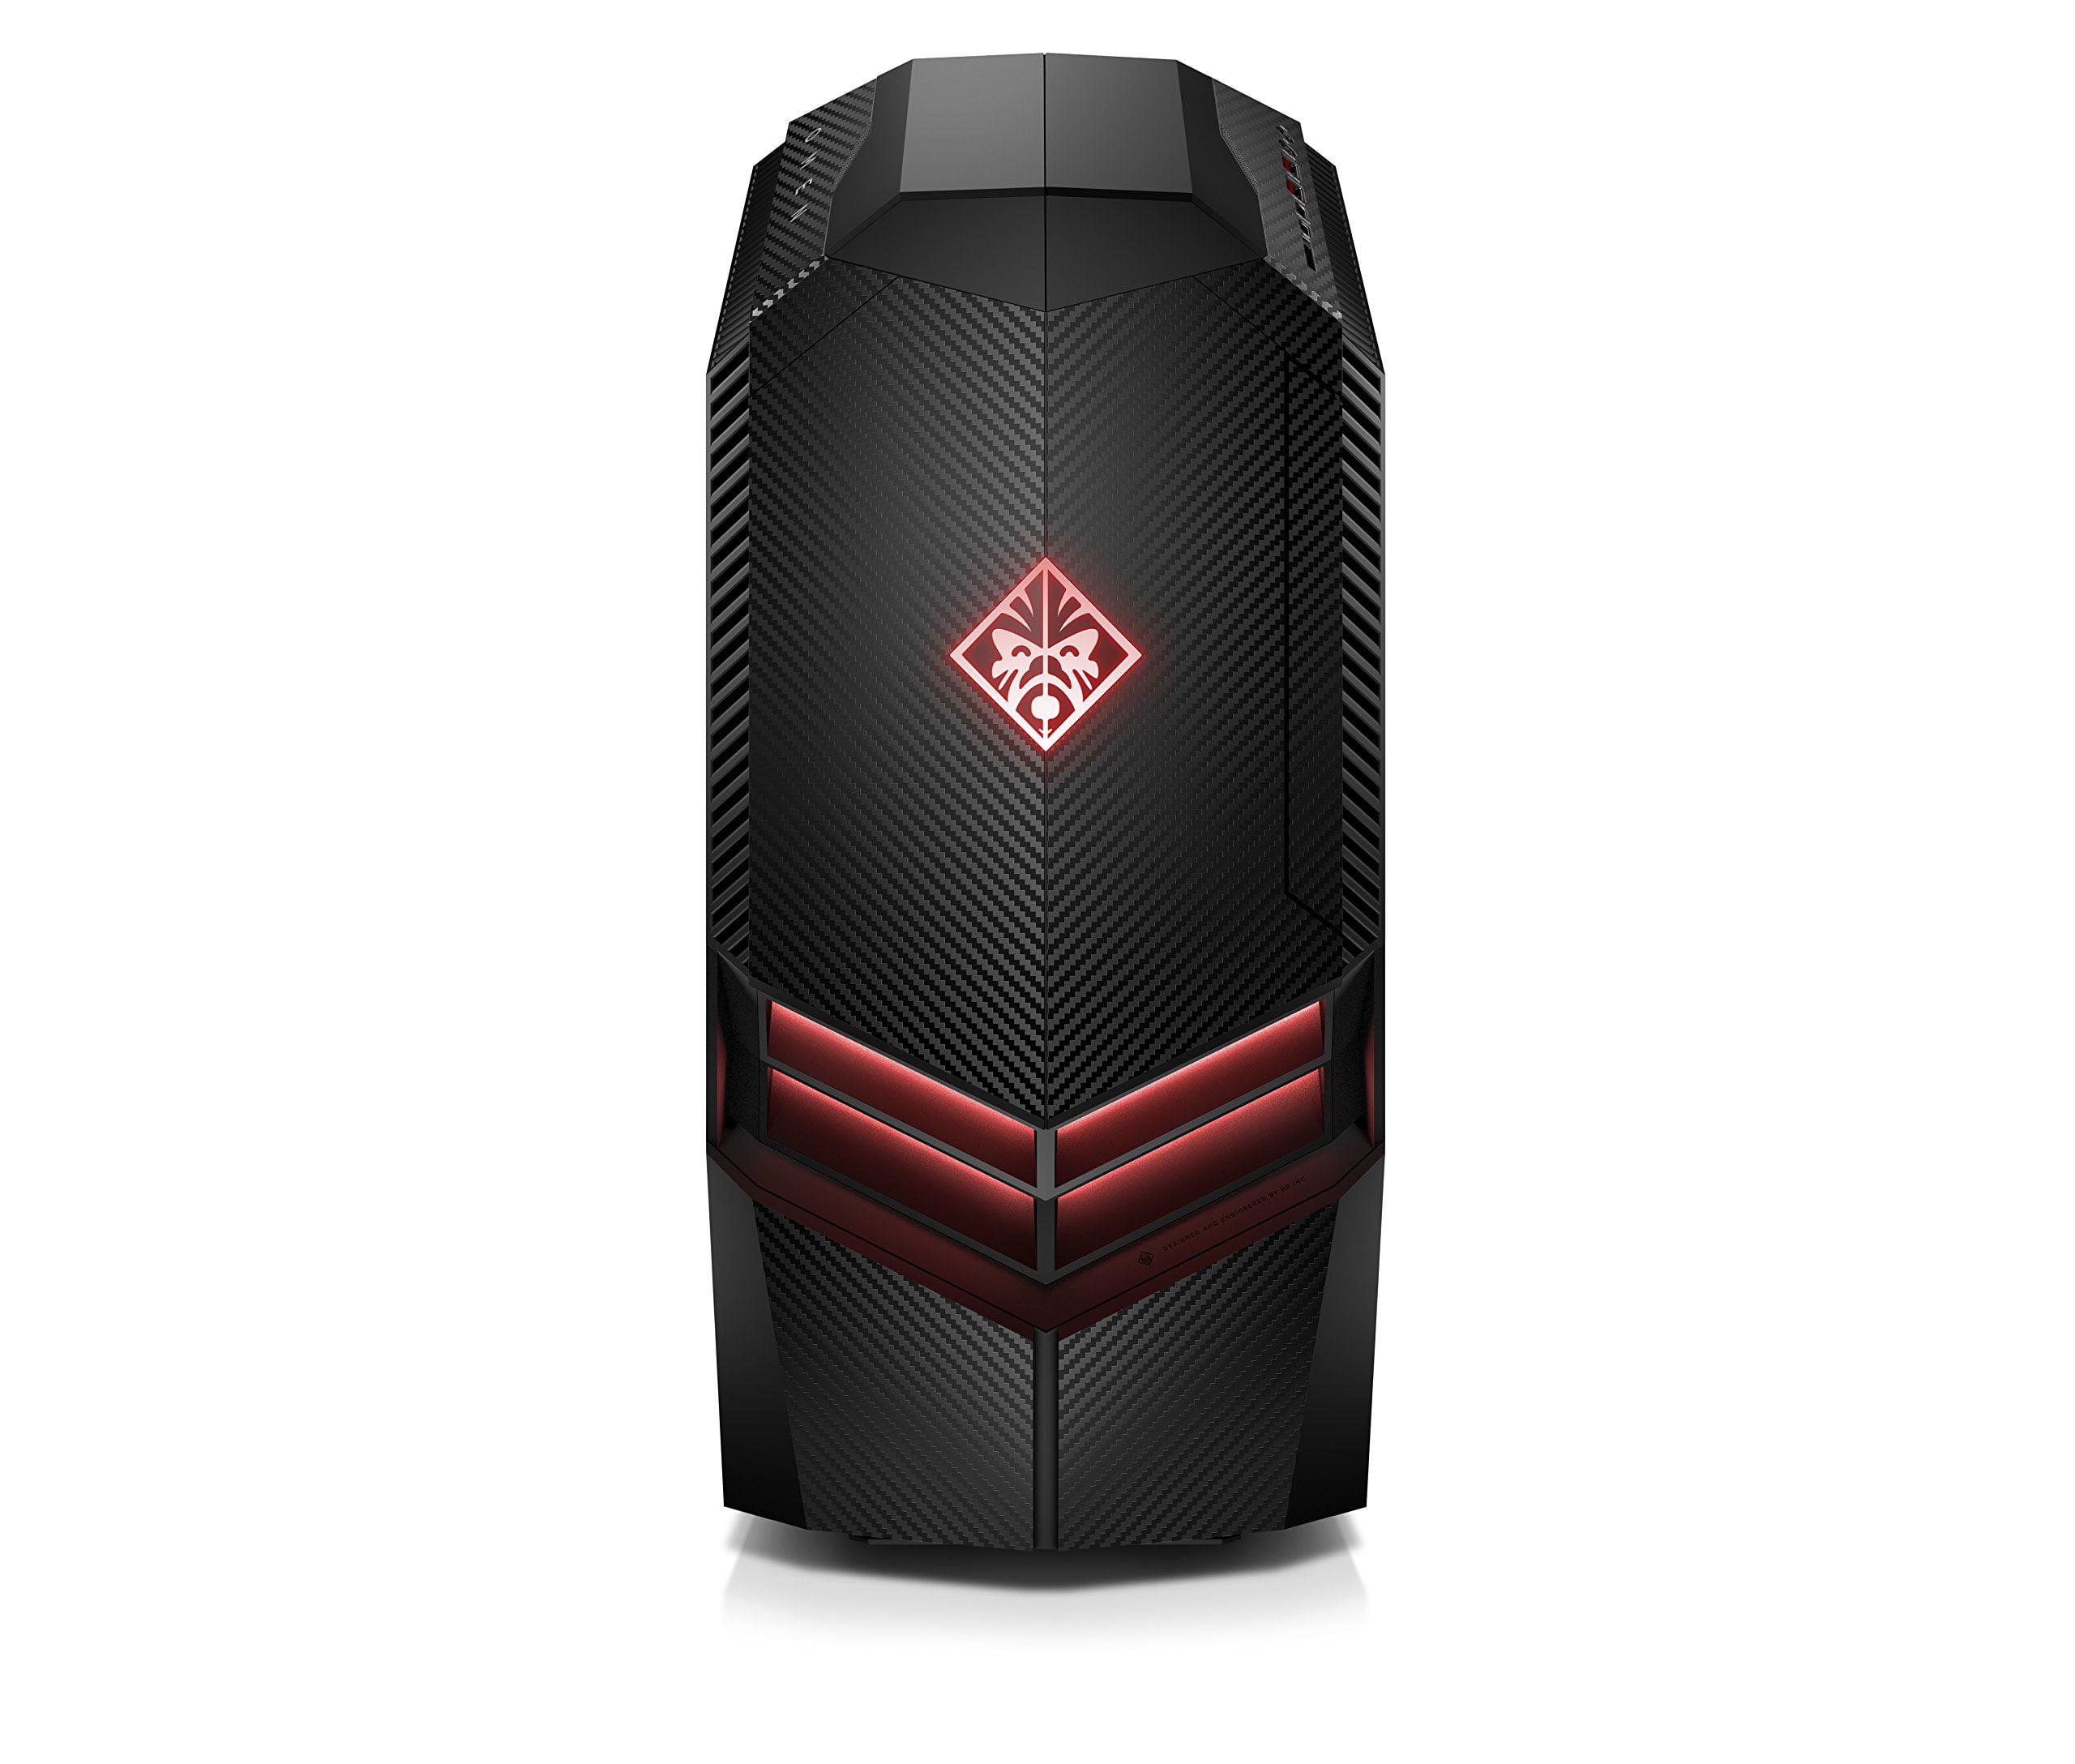 HP Omen Desktop, AMD Ryzen 7 1800x, 3.6GHZ, NVIDIA GeForce GTX 1080 8GB GDDR5X Graphic Card, 16GB DDR4 Memory,... by HP